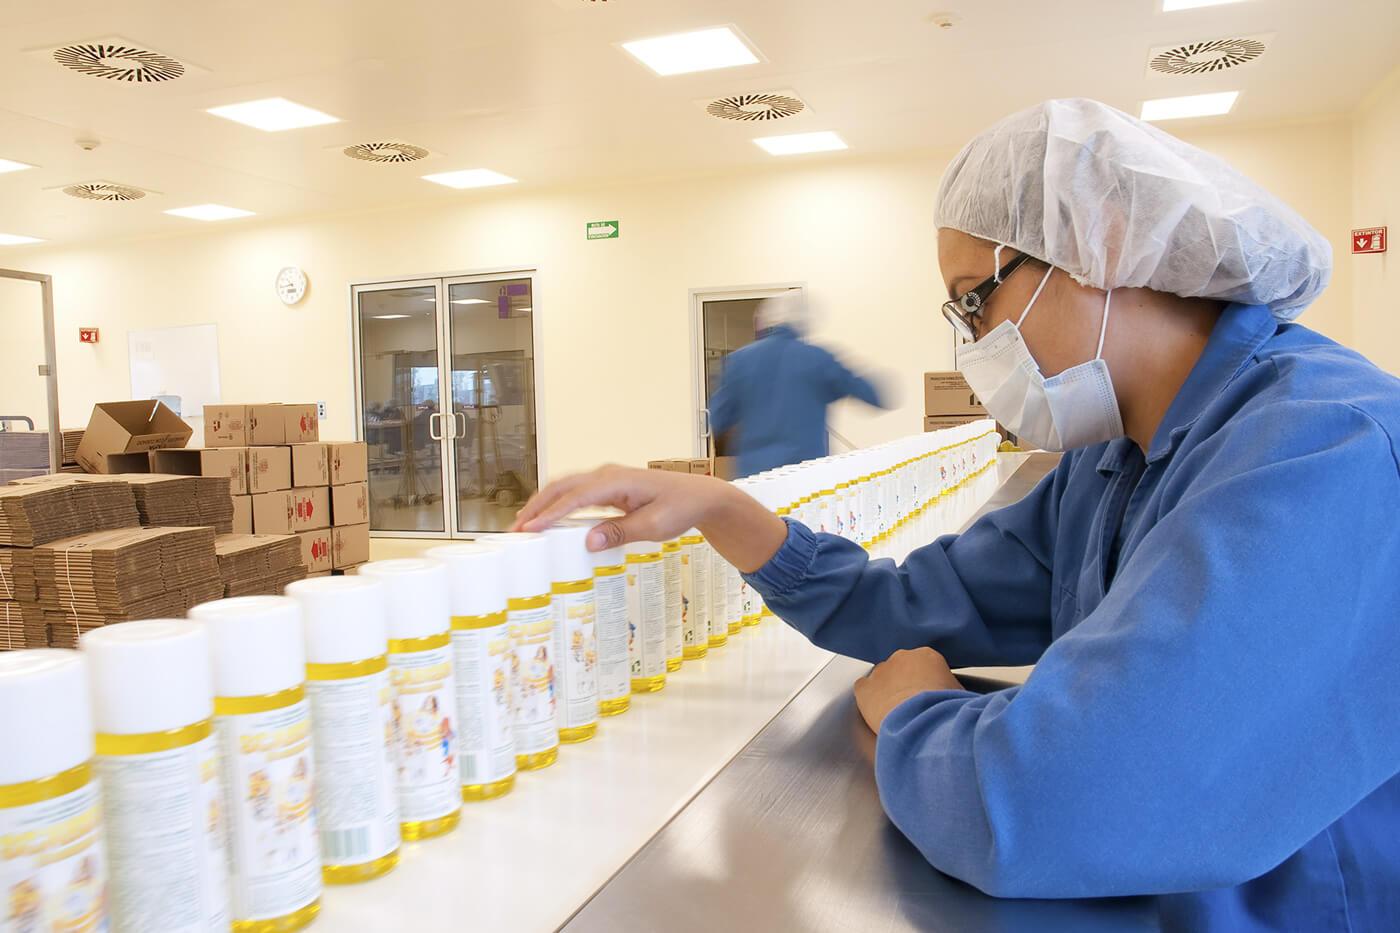 Fabricacion de medicamentos